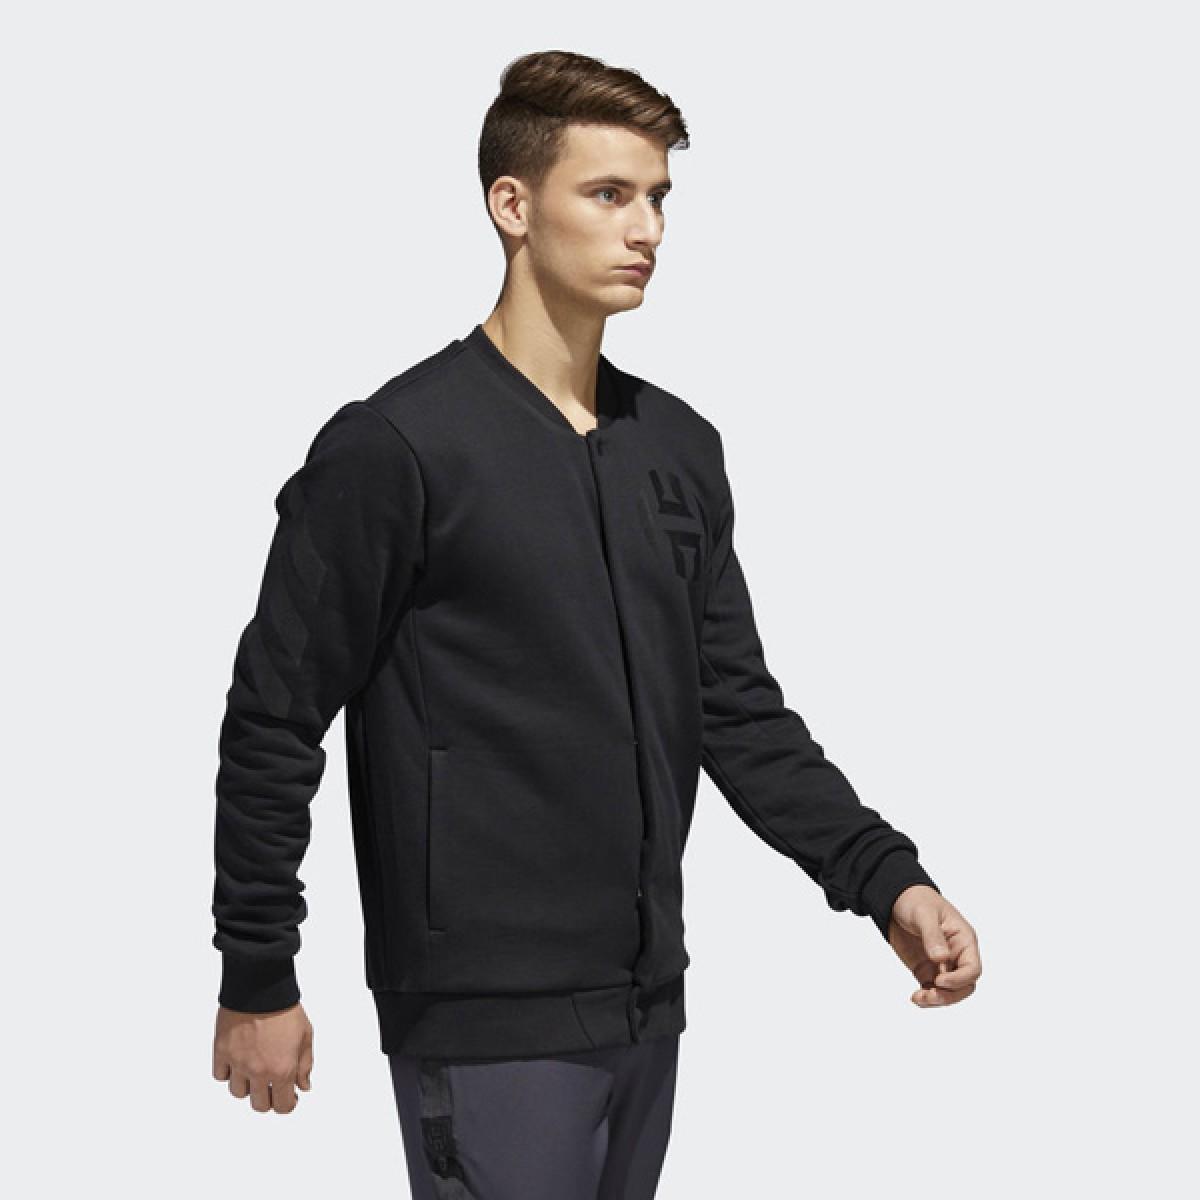 Adidas Harden Varsity Jacket 'Black' CE7323